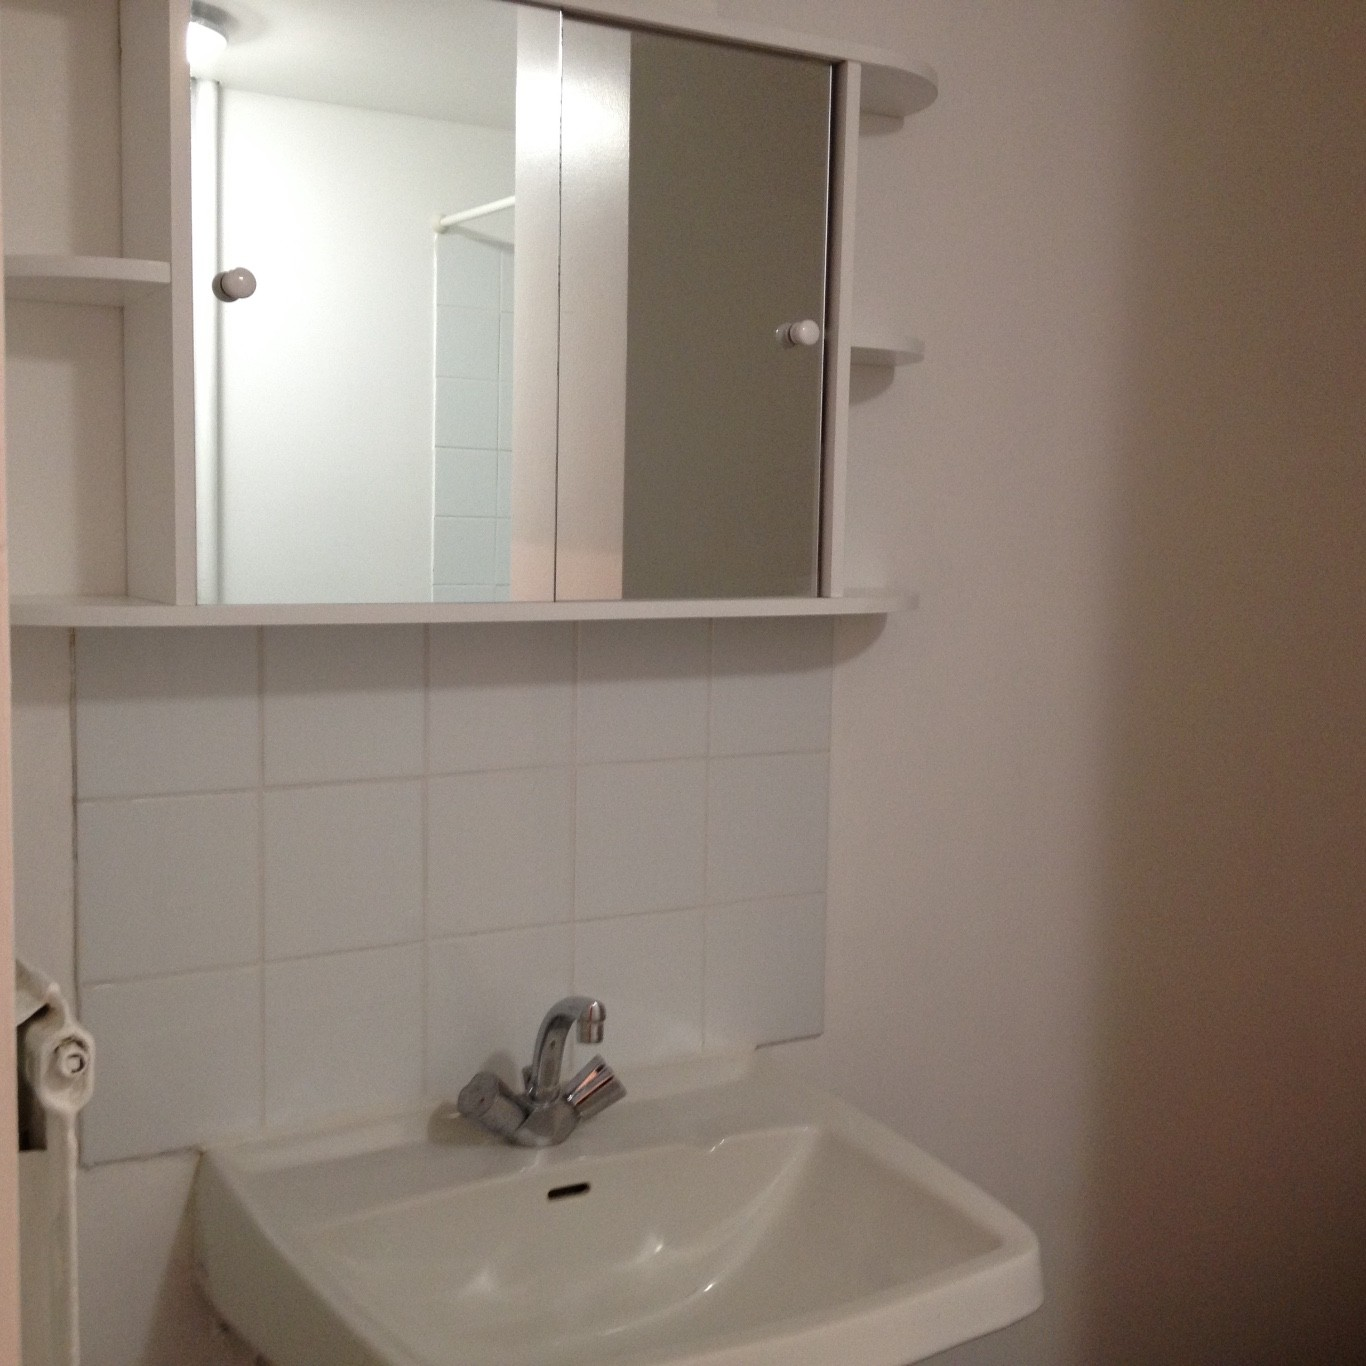 dijon gare location appartement 1 pi ce 30m2 480 cc r f 16 10 100738 cm immobilier. Black Bedroom Furniture Sets. Home Design Ideas